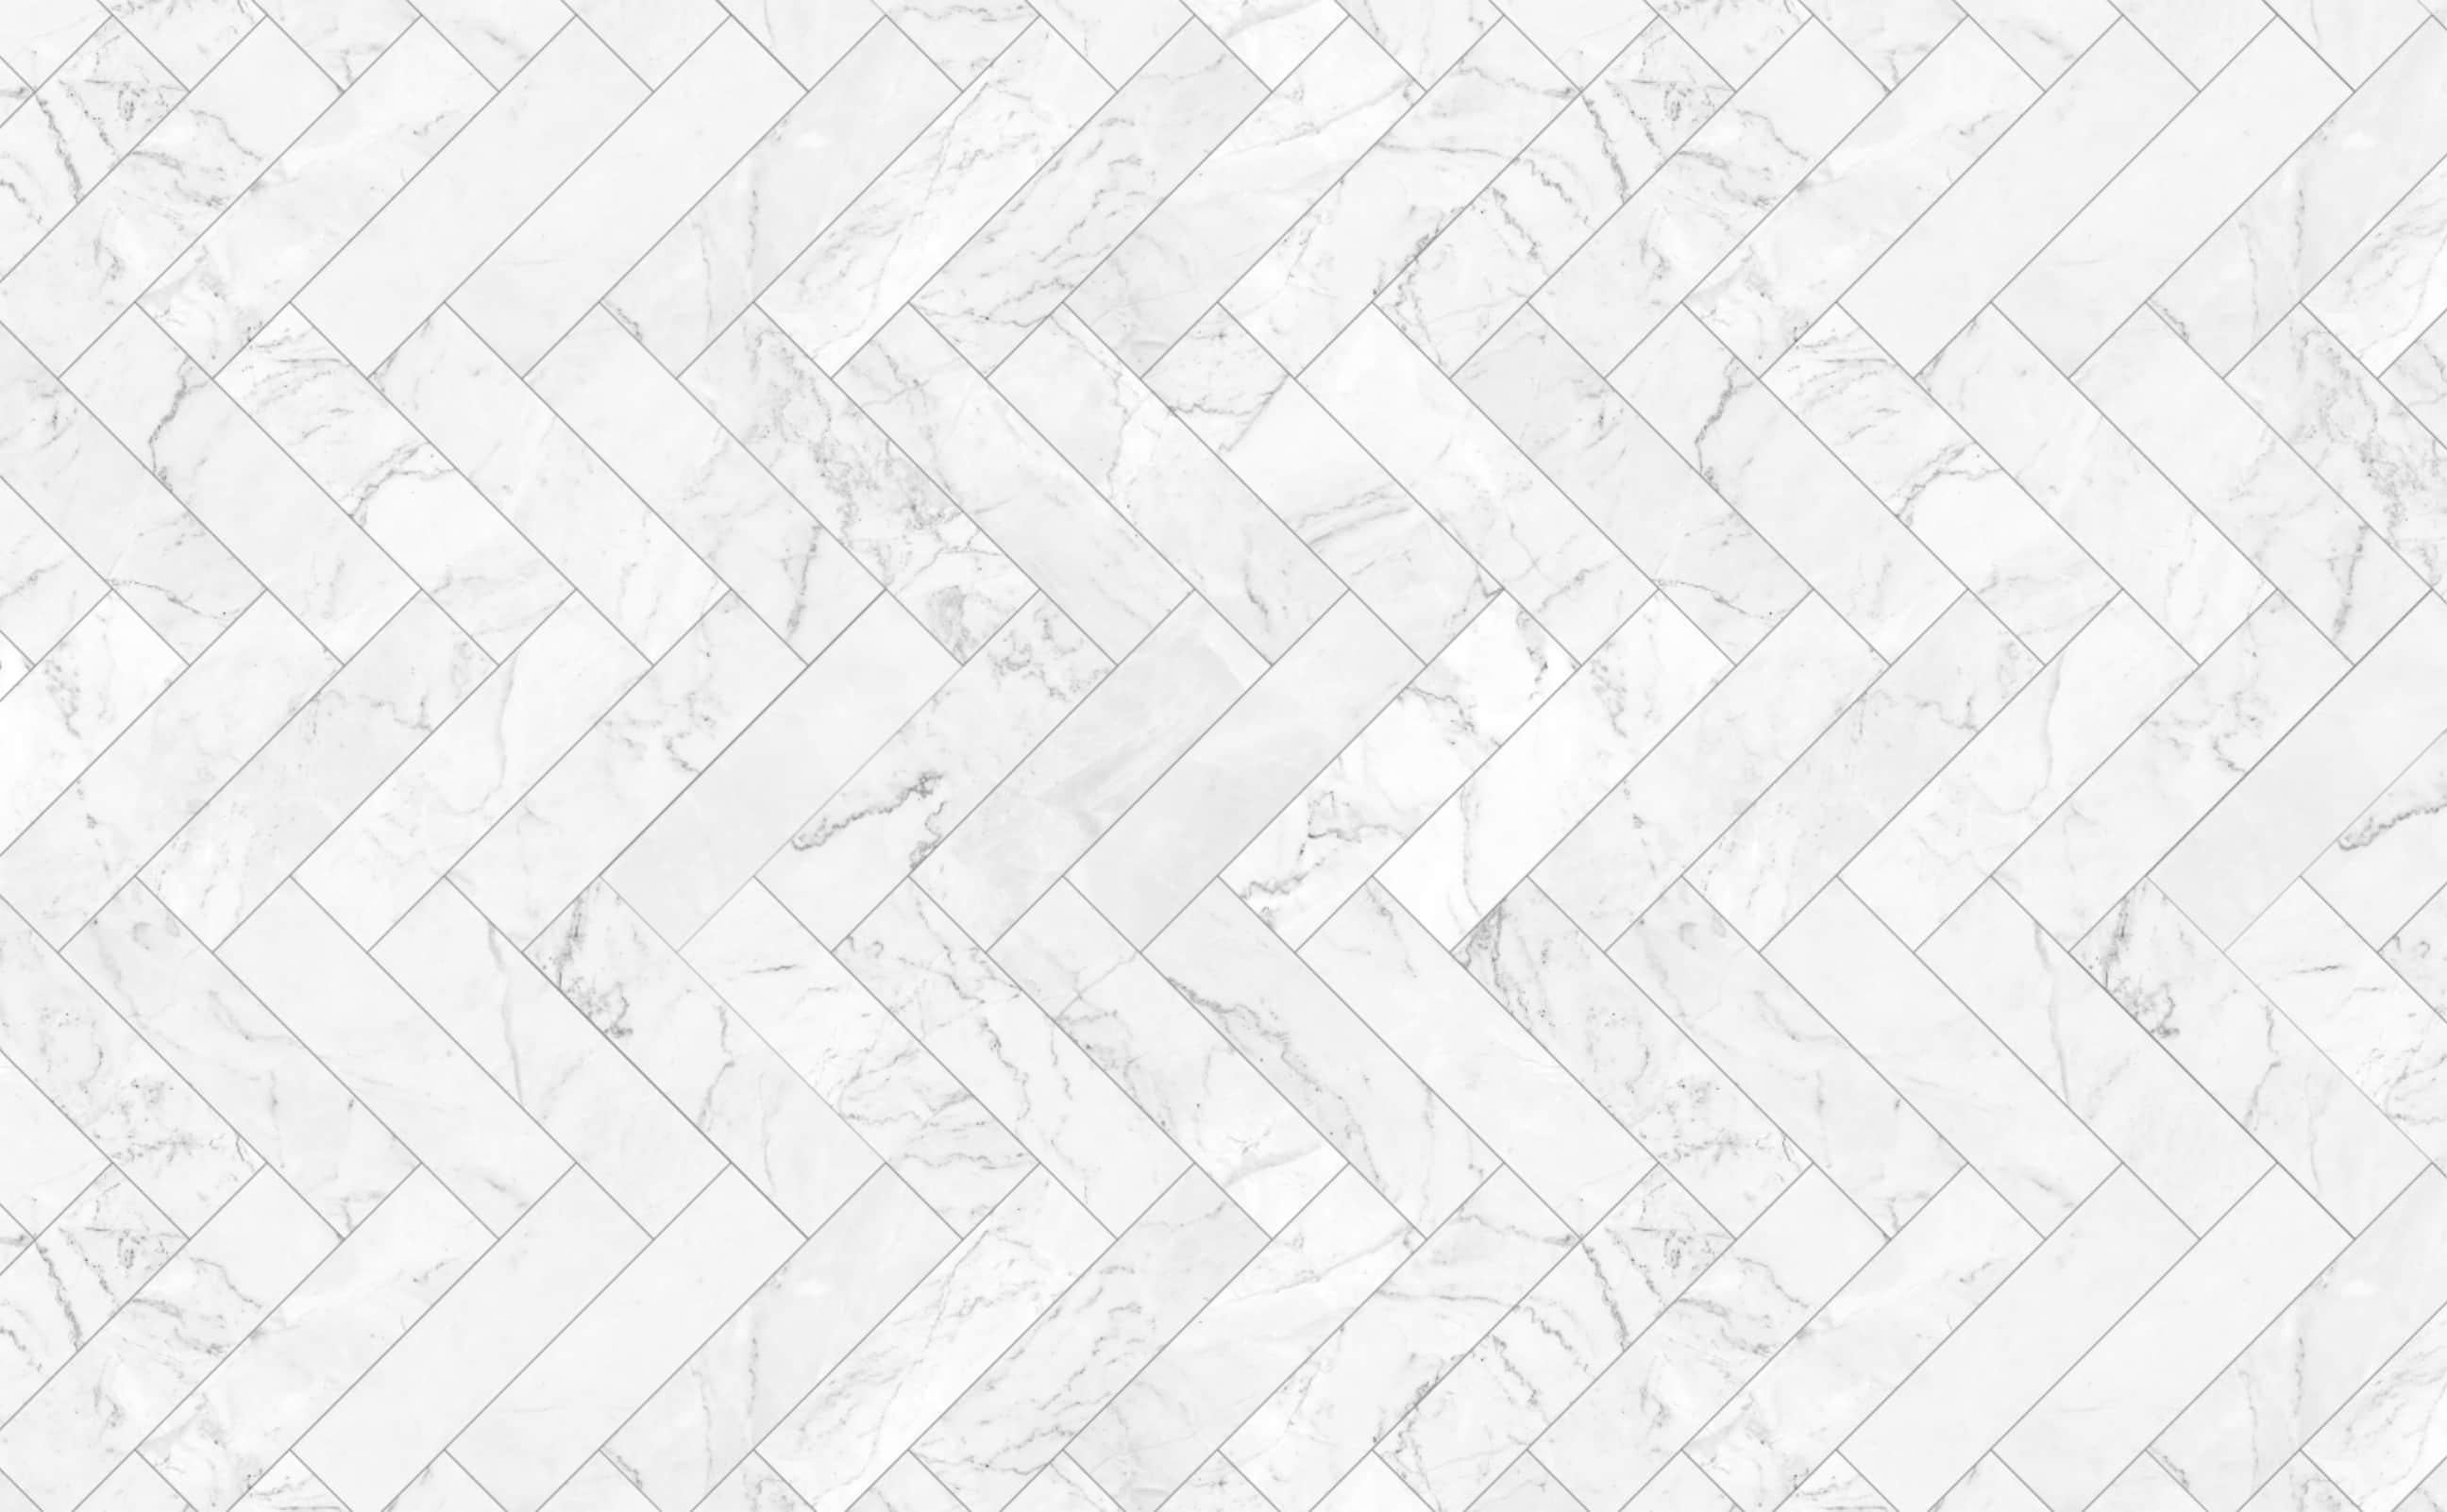 carrara herringbone polished marble tile pattern wallpaper for walls classic concept